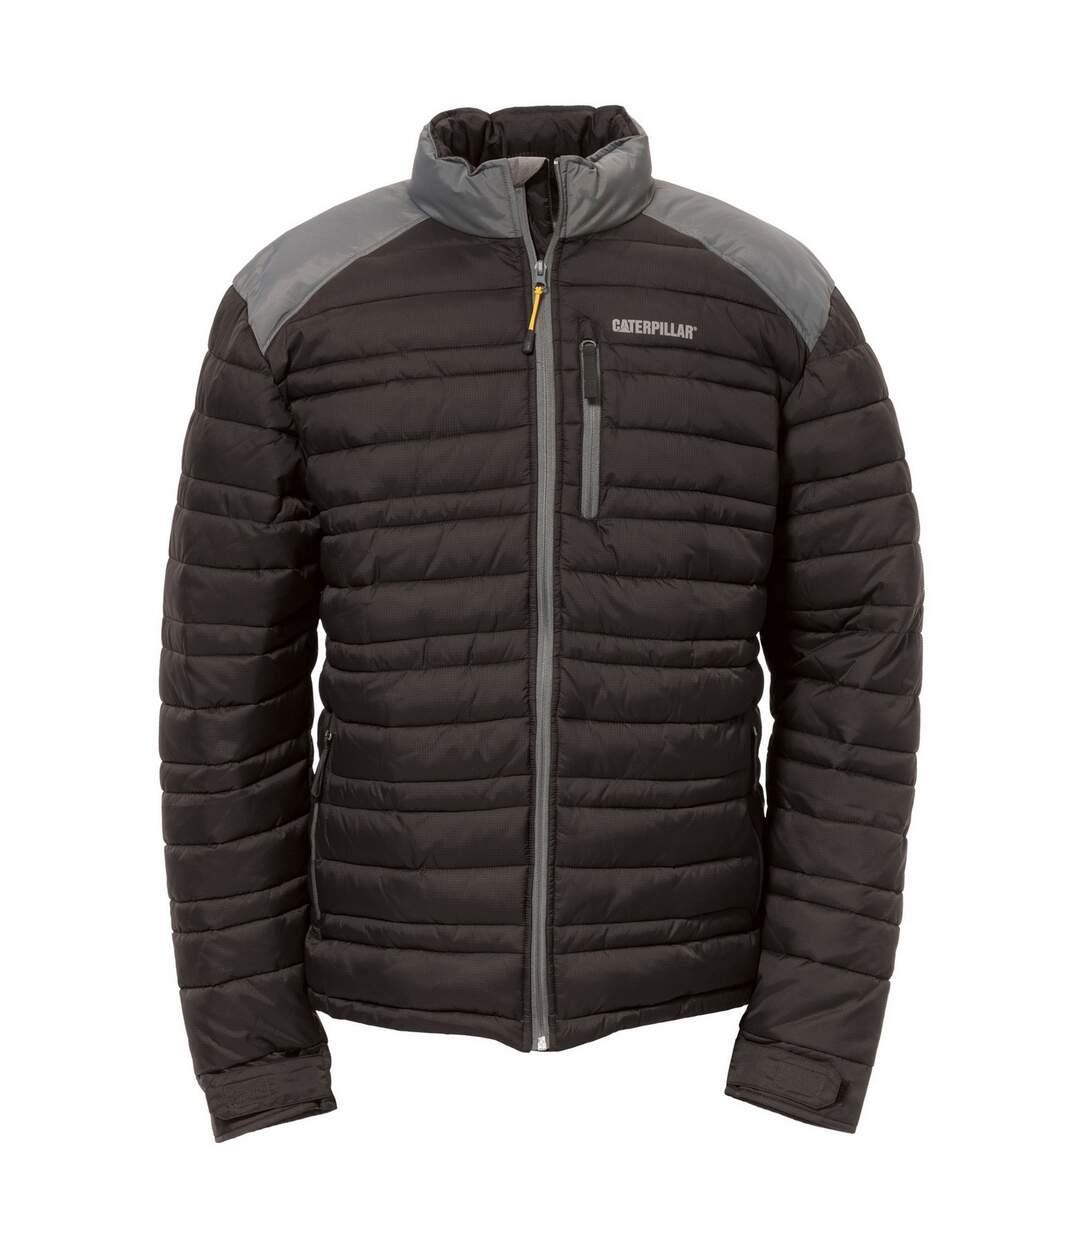 Caterpillar Mens Defender Insulated Zip Up Jacket (Black) - UTFS4023